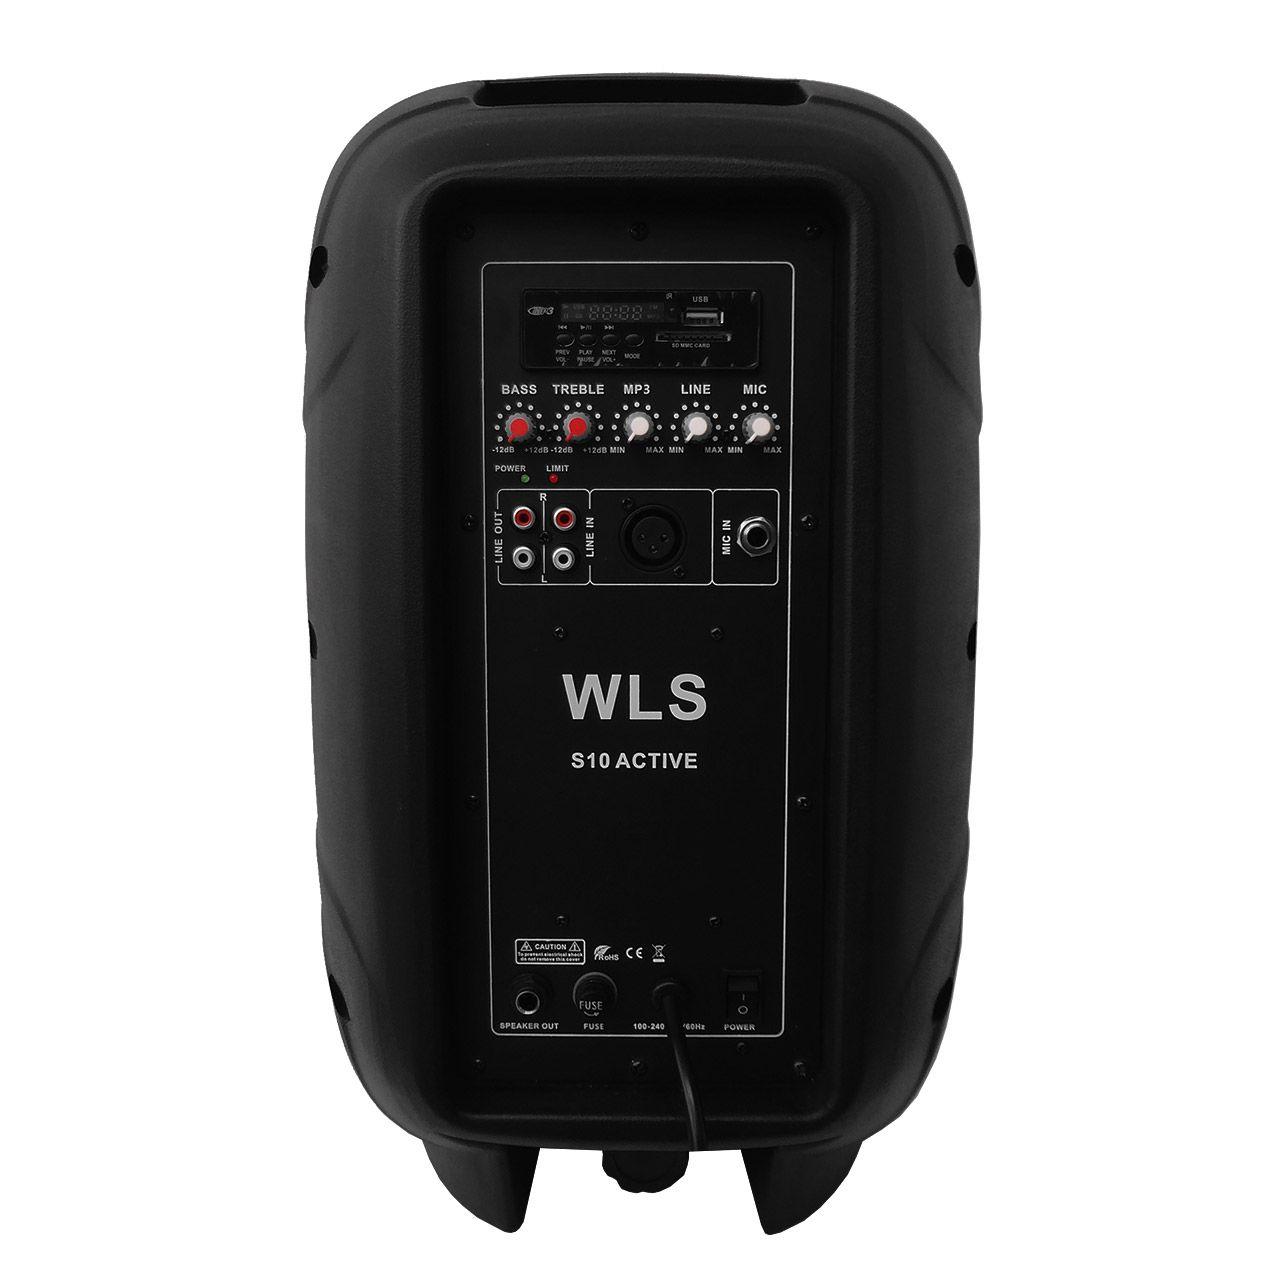 Kit 4 Caixa De Som Ativa Passiva Wls S10 + Suportes + Mesa Omx8 + Microfone Vws20